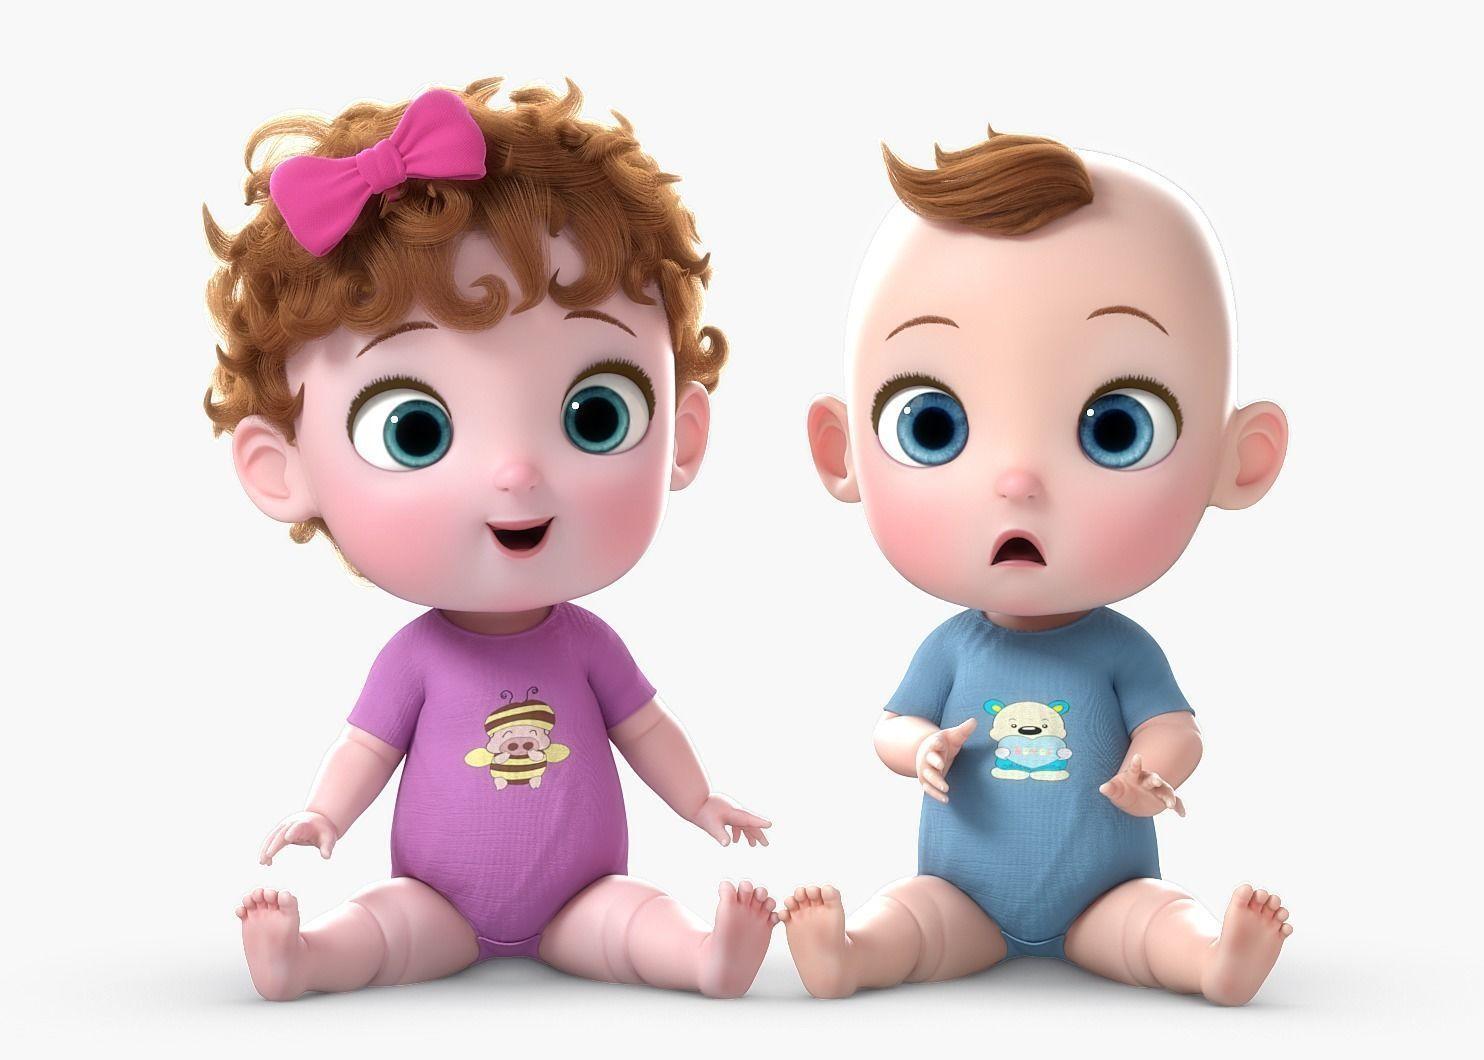 Cartoon Baby Twin Rigged 3d Model Family Cartoon Baby Cartoon Twin Babies